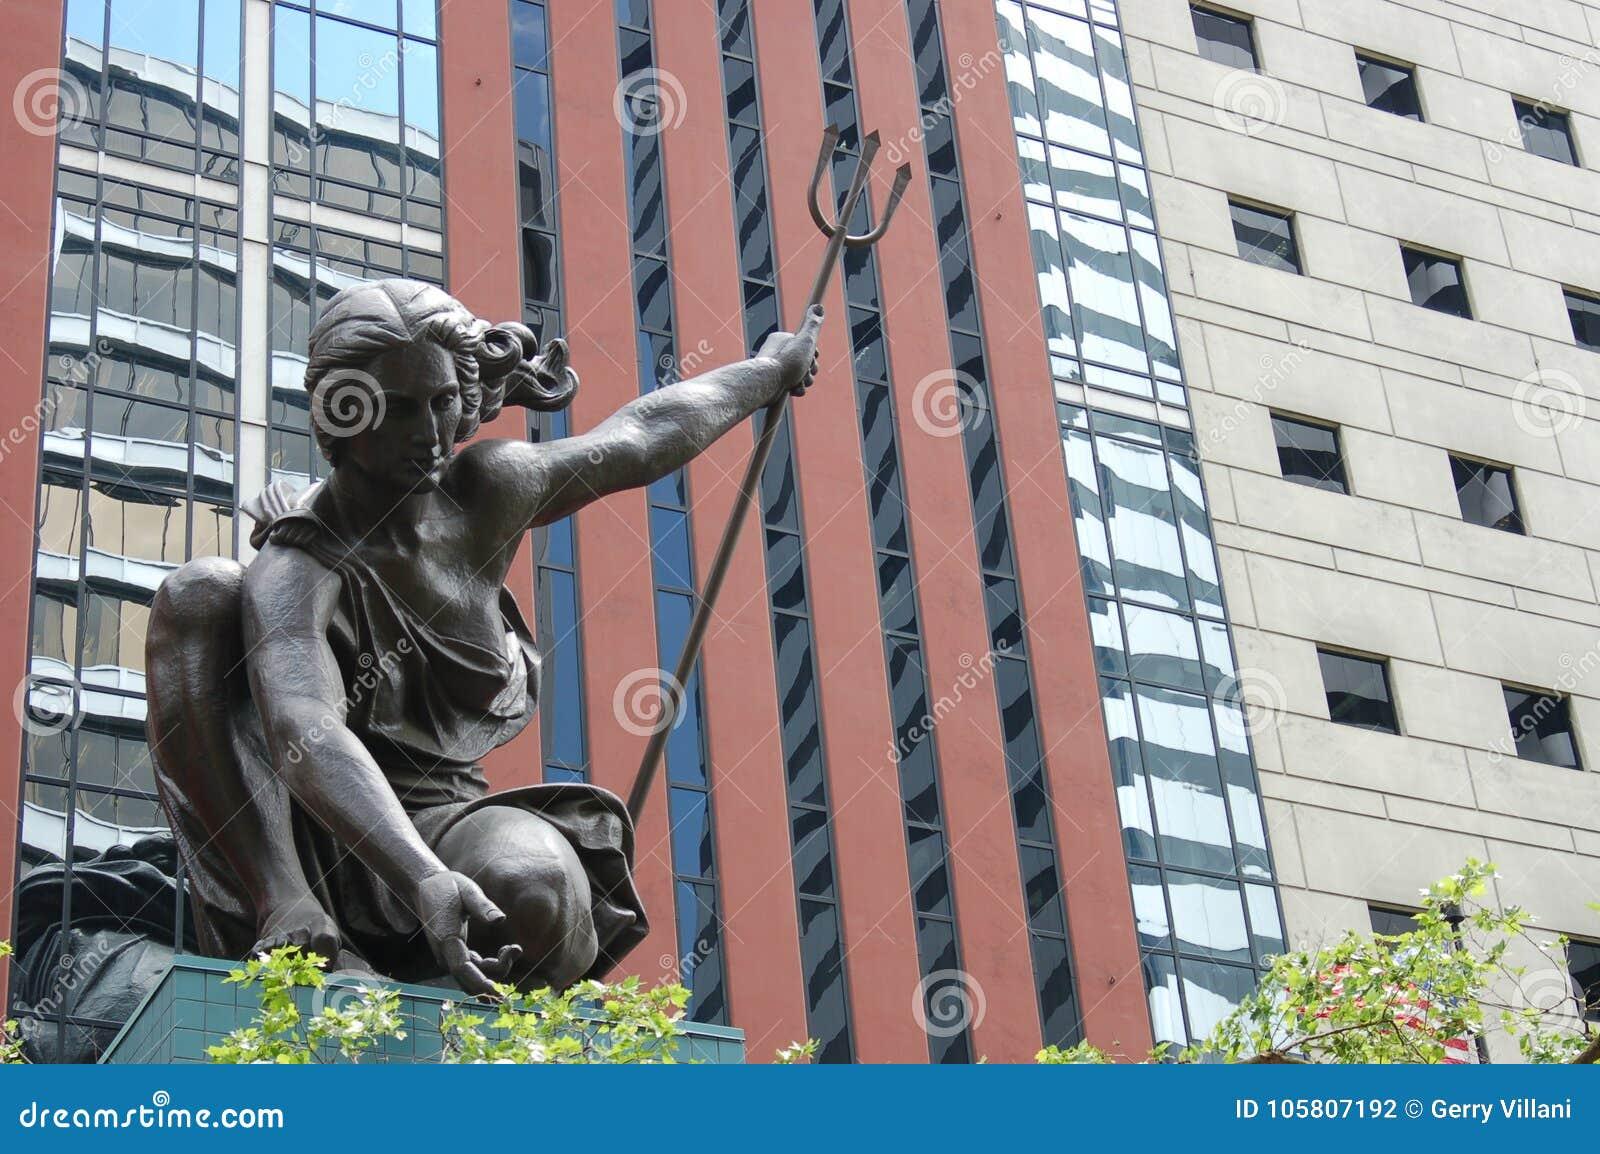 `Portlandia` statue in downtown, Portland, Oregon